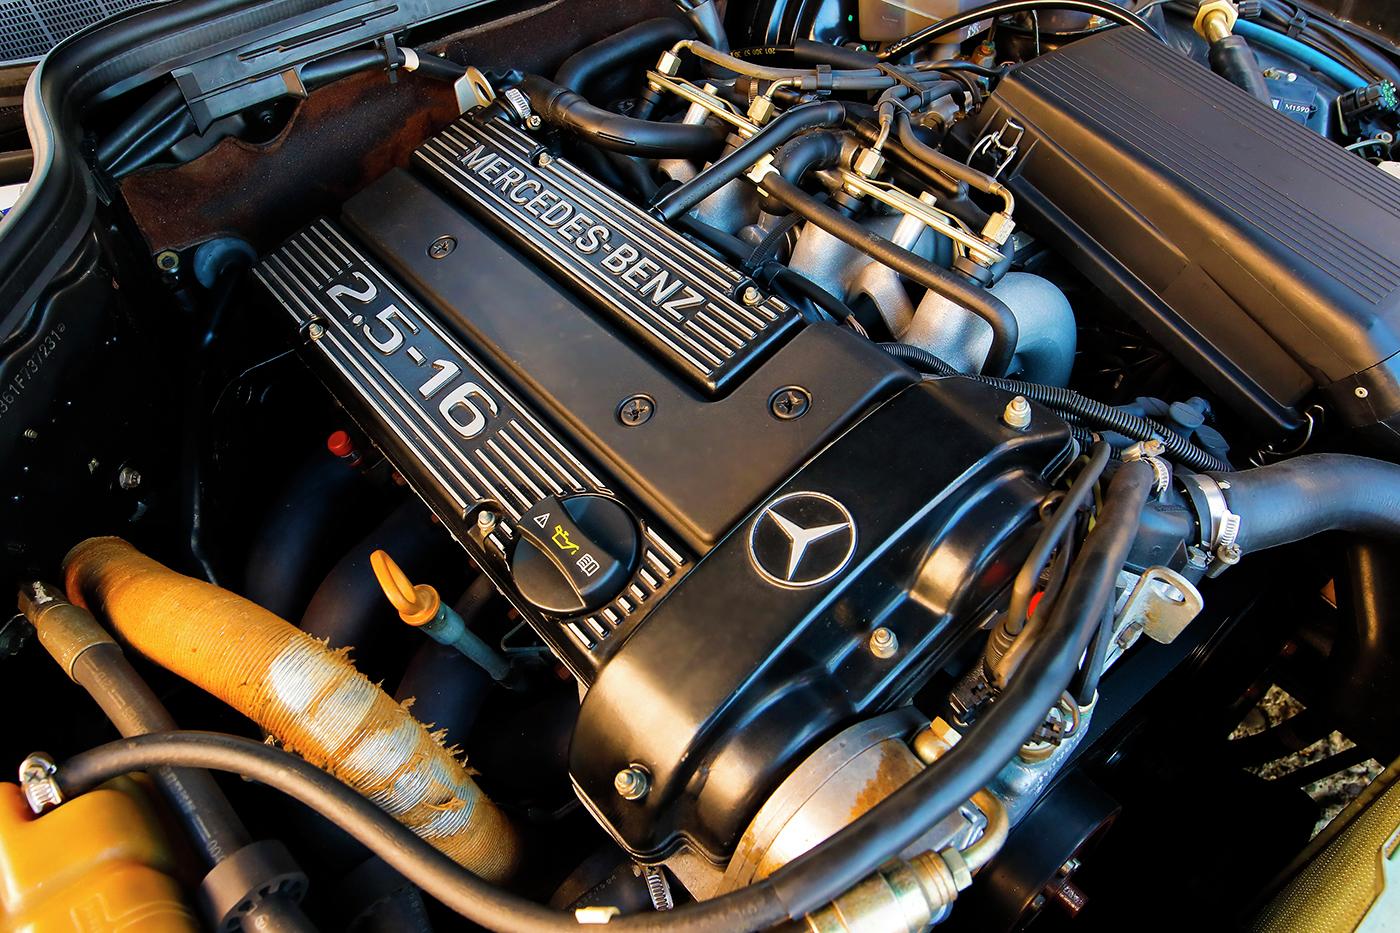 1990_Mercedes-Benz_190E_2.5-16_Evolution_II_0034